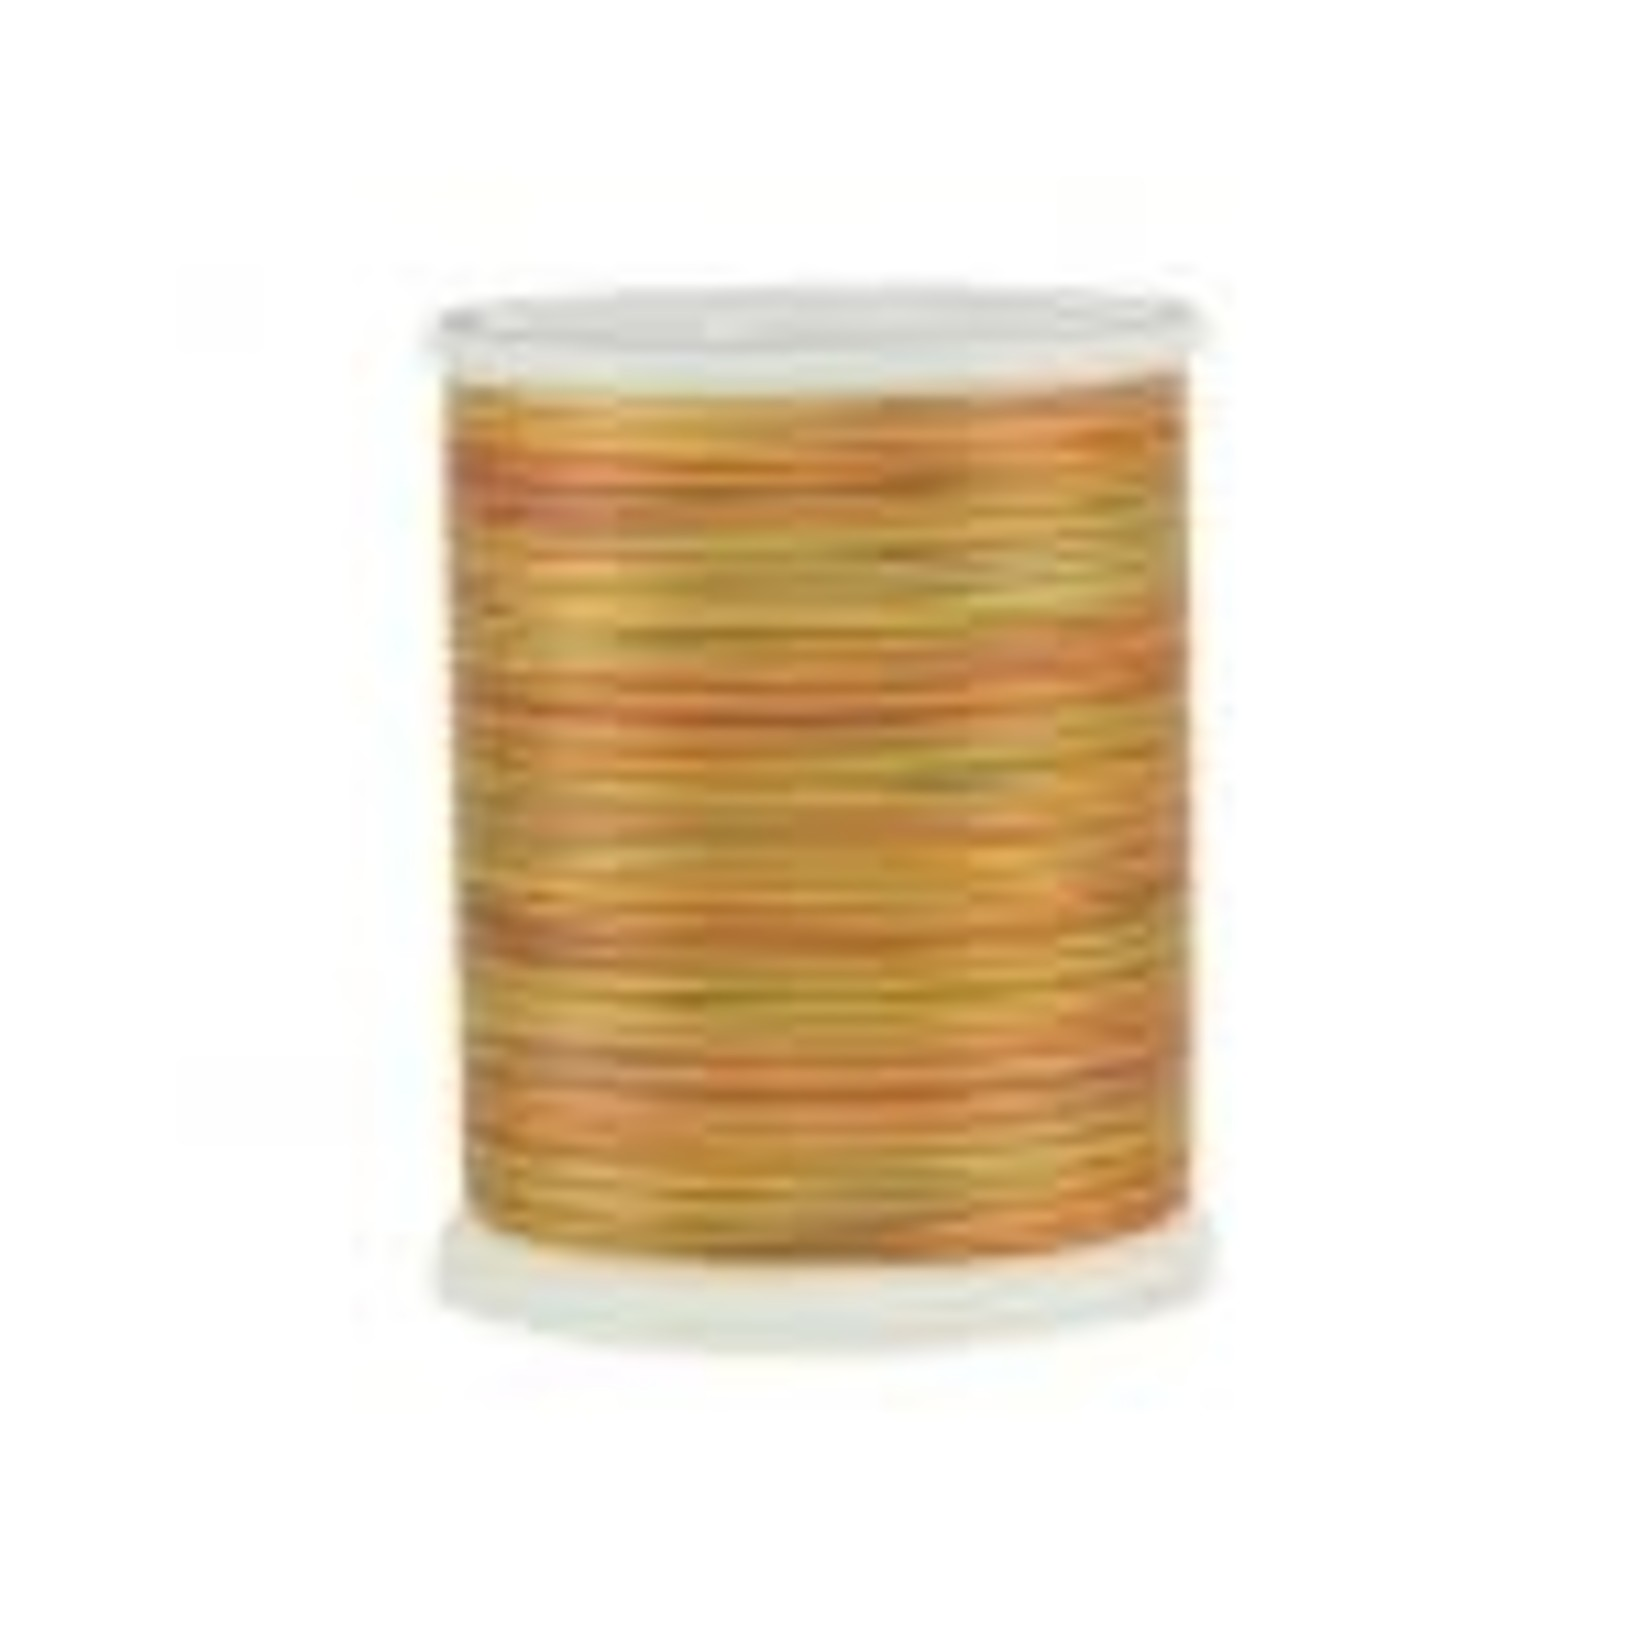 Superior Threads King Tut - #40 - 457 m - 0906 Autumn Days